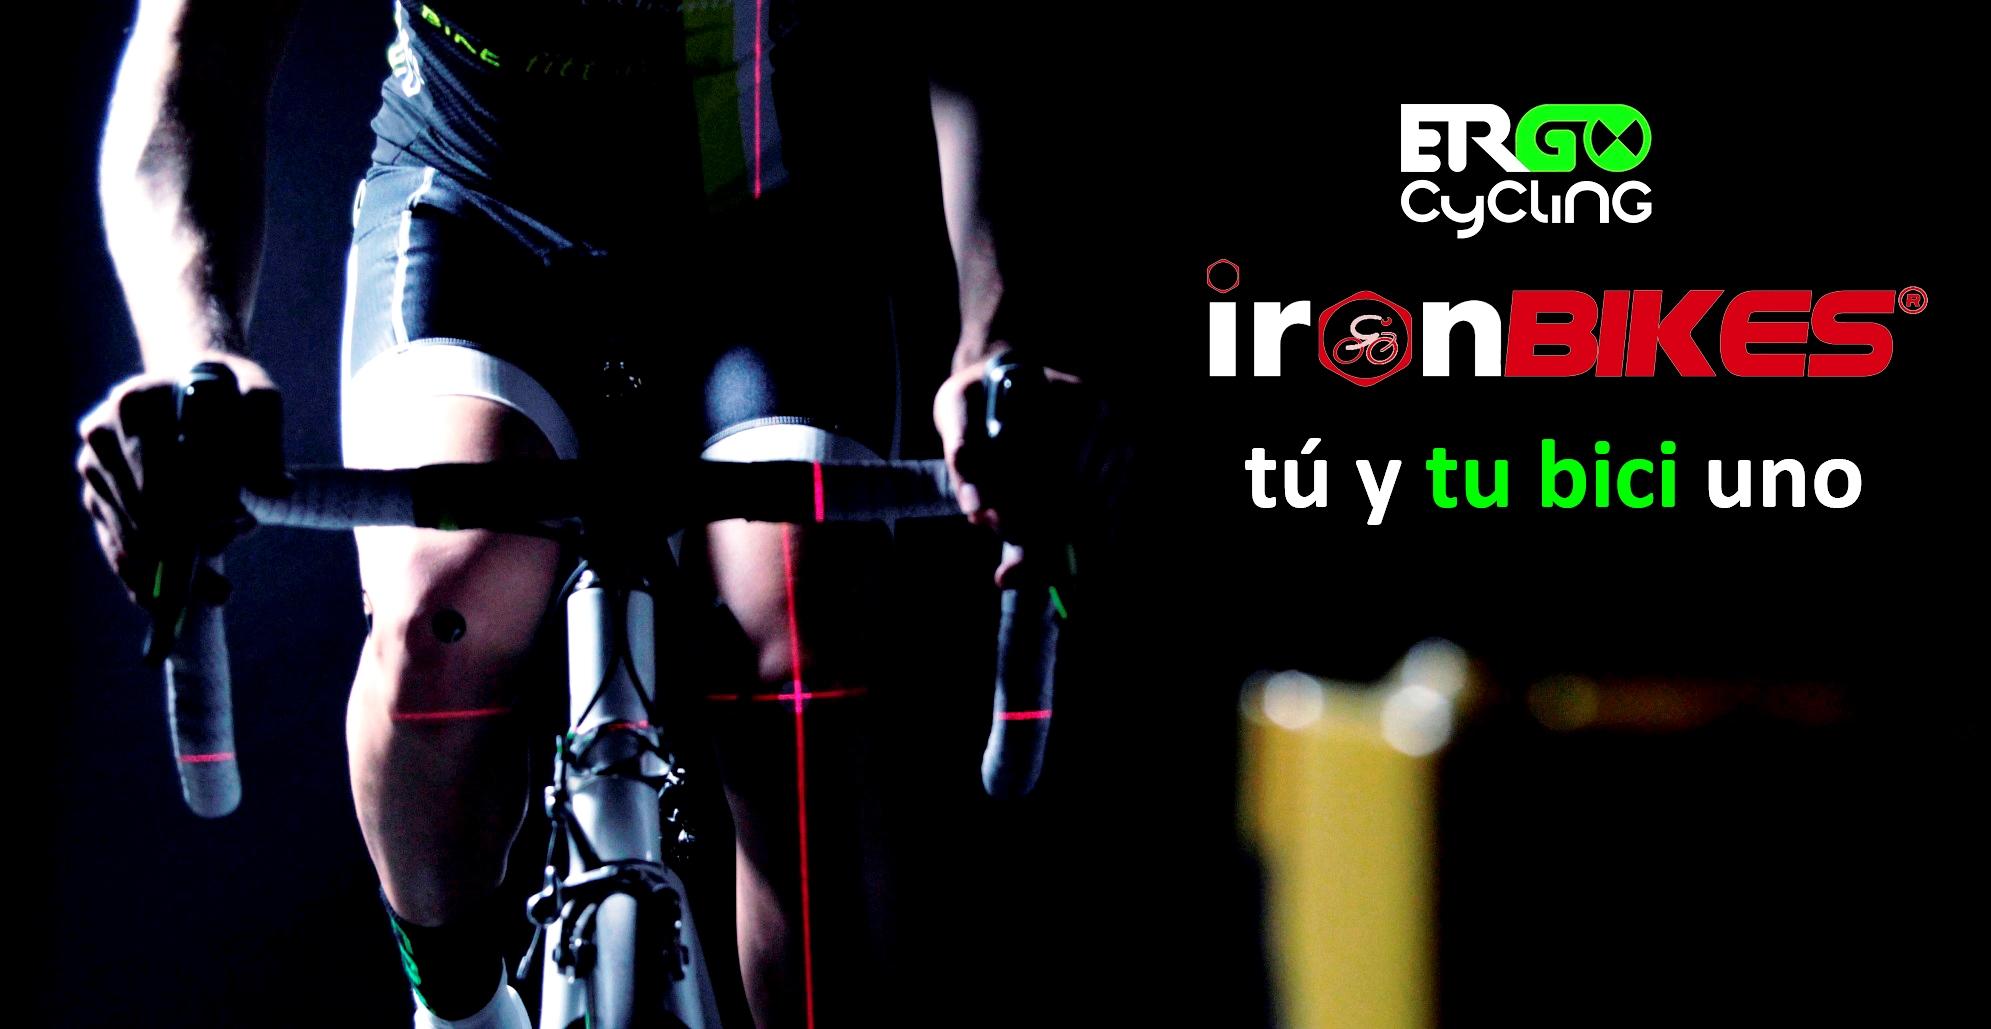 Bikefitting en ironBIKES